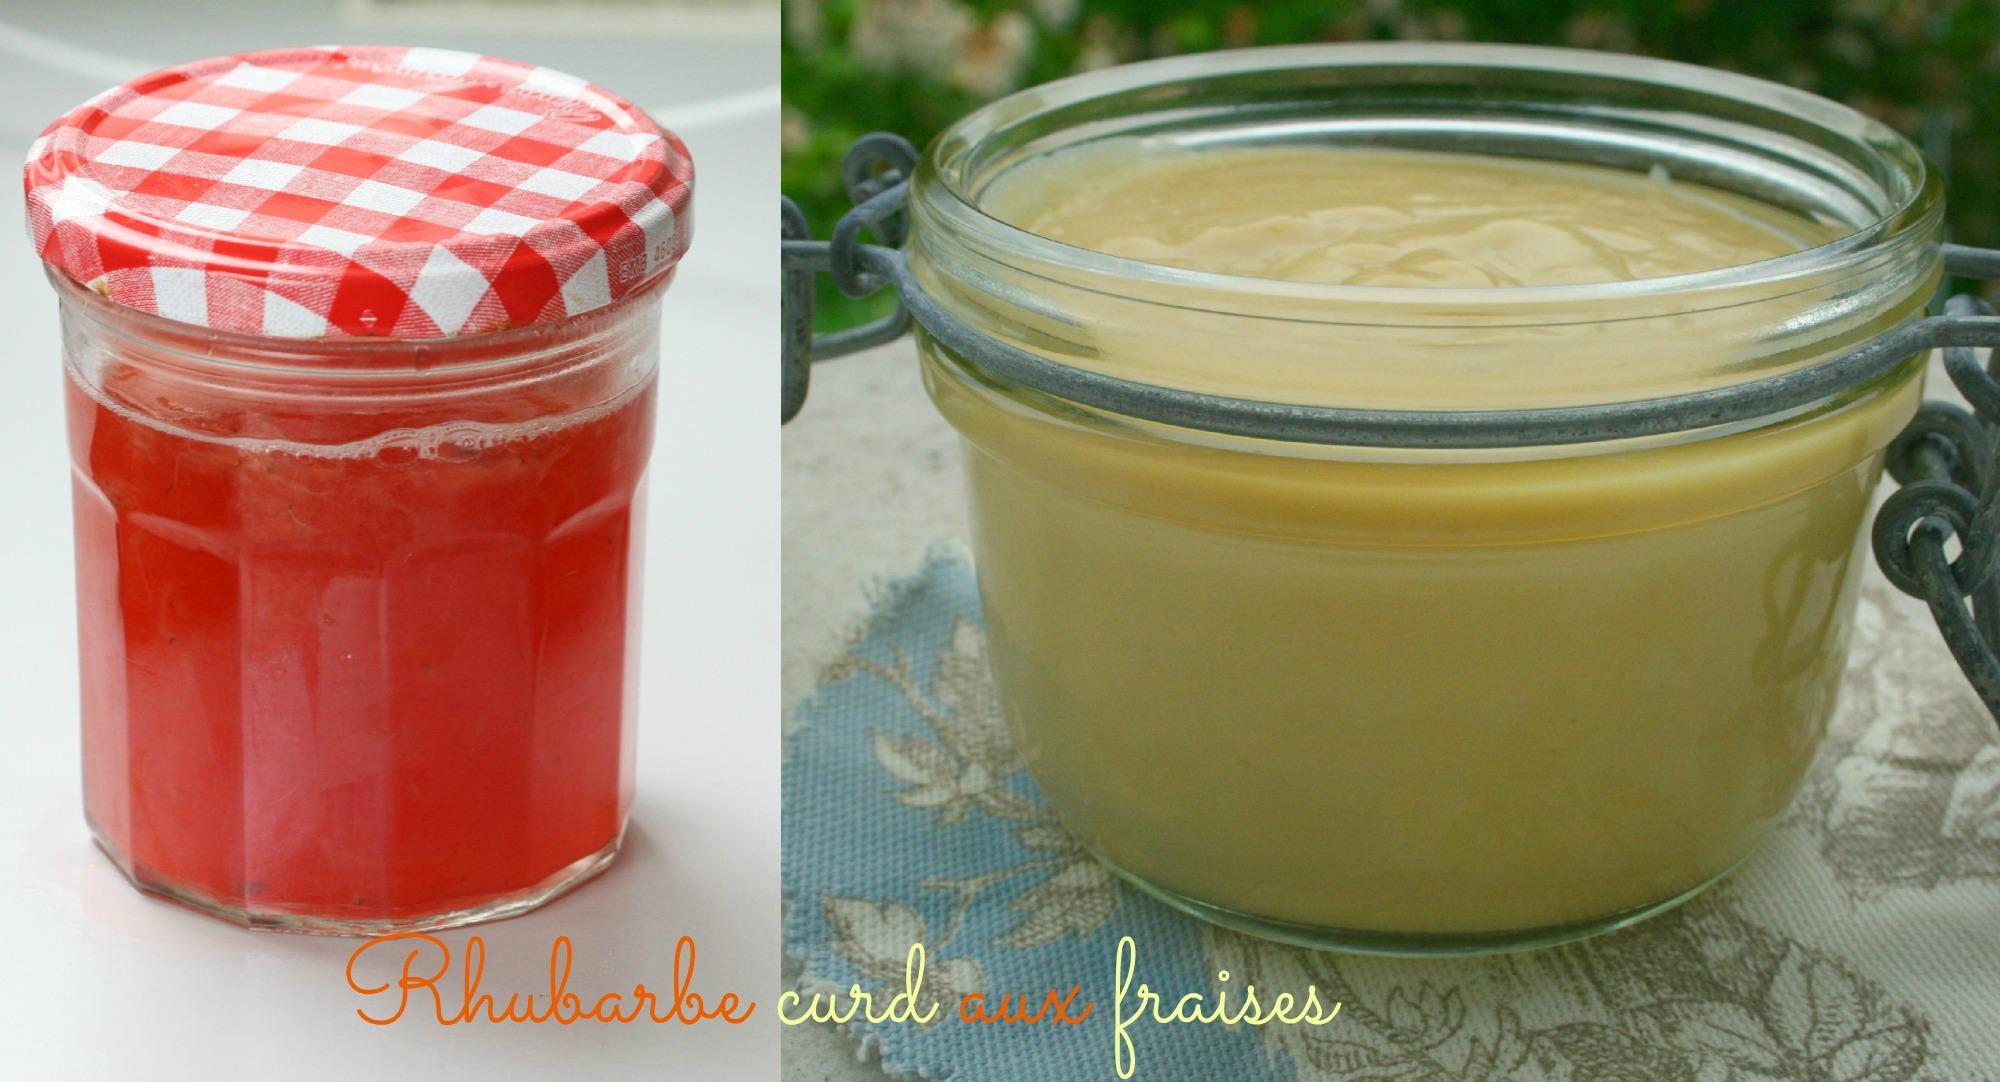 Rhubarbe curd aux fraises happy cooking - Quand ramasser la rhubarbe ...